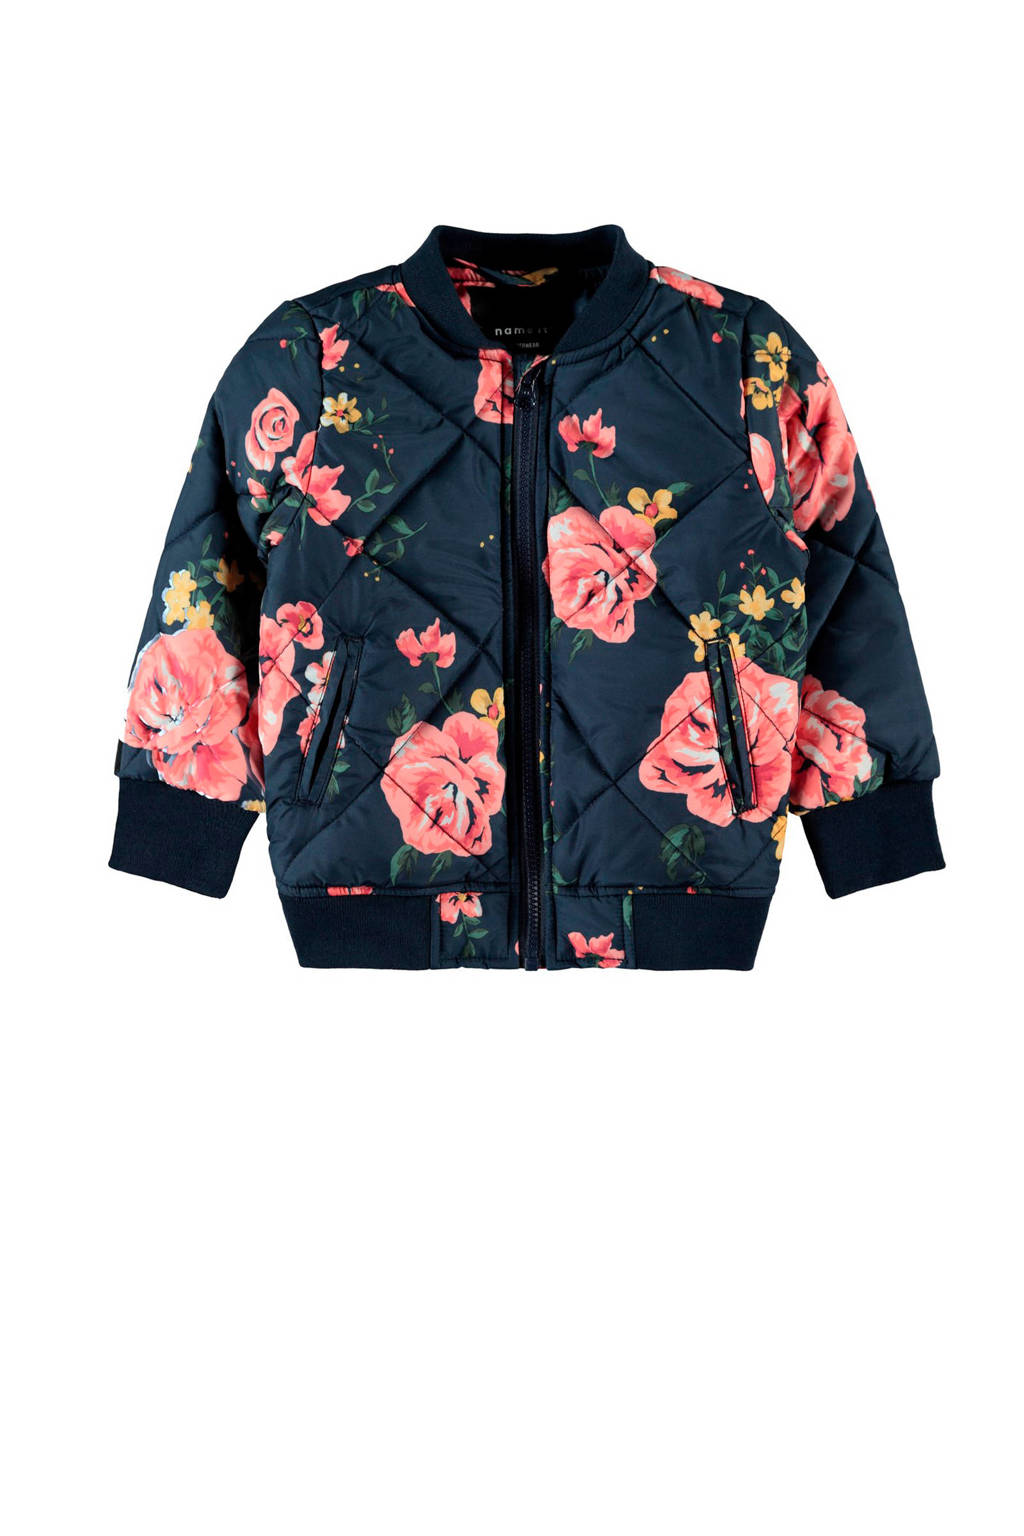 NAME IT MINI bomberjack Marie met all over print donkerblauw/roze/groen